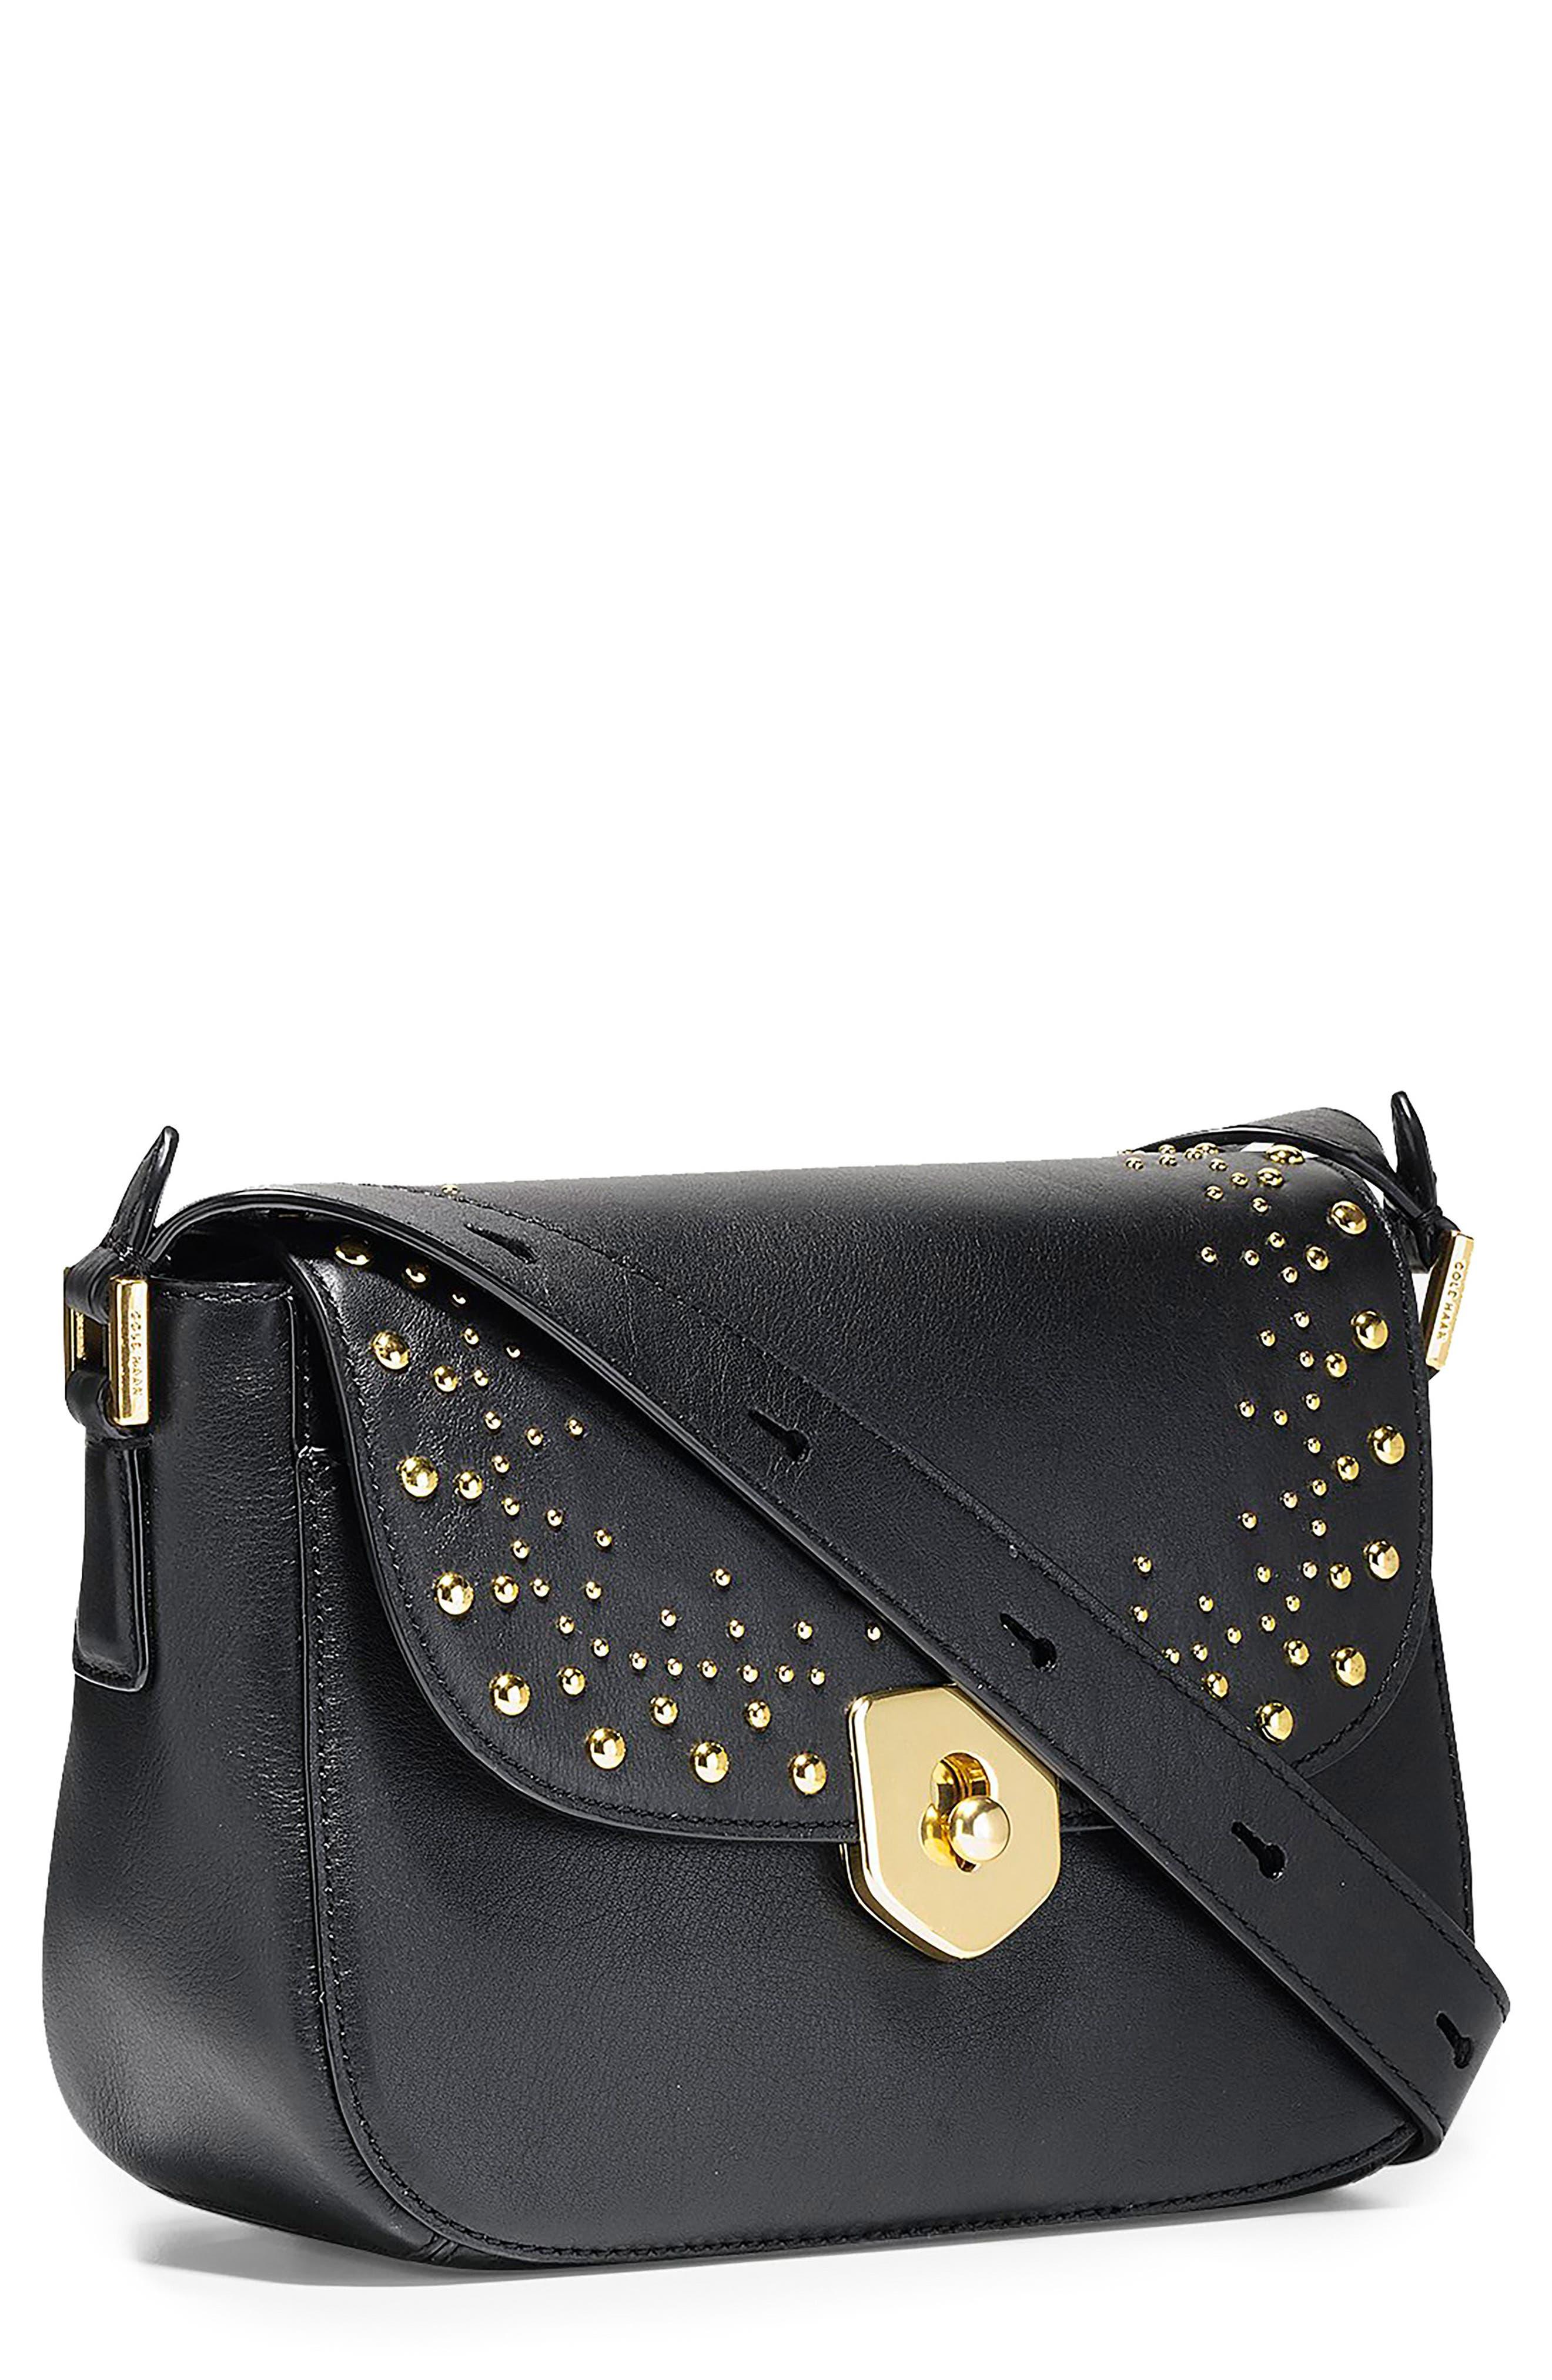 Mini Marli Studded Leather Saddle Bag,                             Main thumbnail 1, color,                             Black